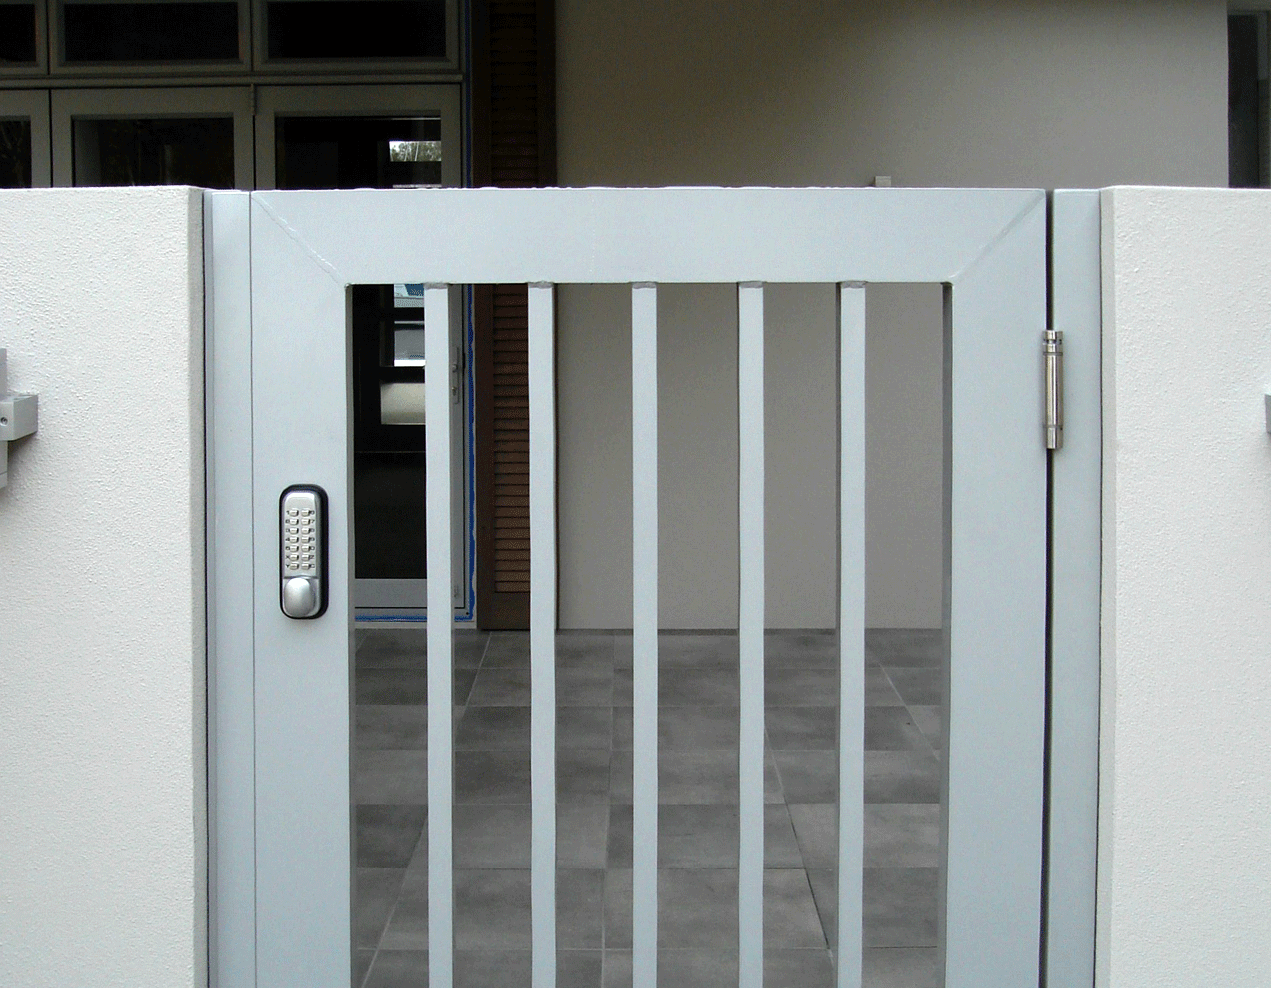 Instyle Gates Pedestrian Entrance Gate With Keypad